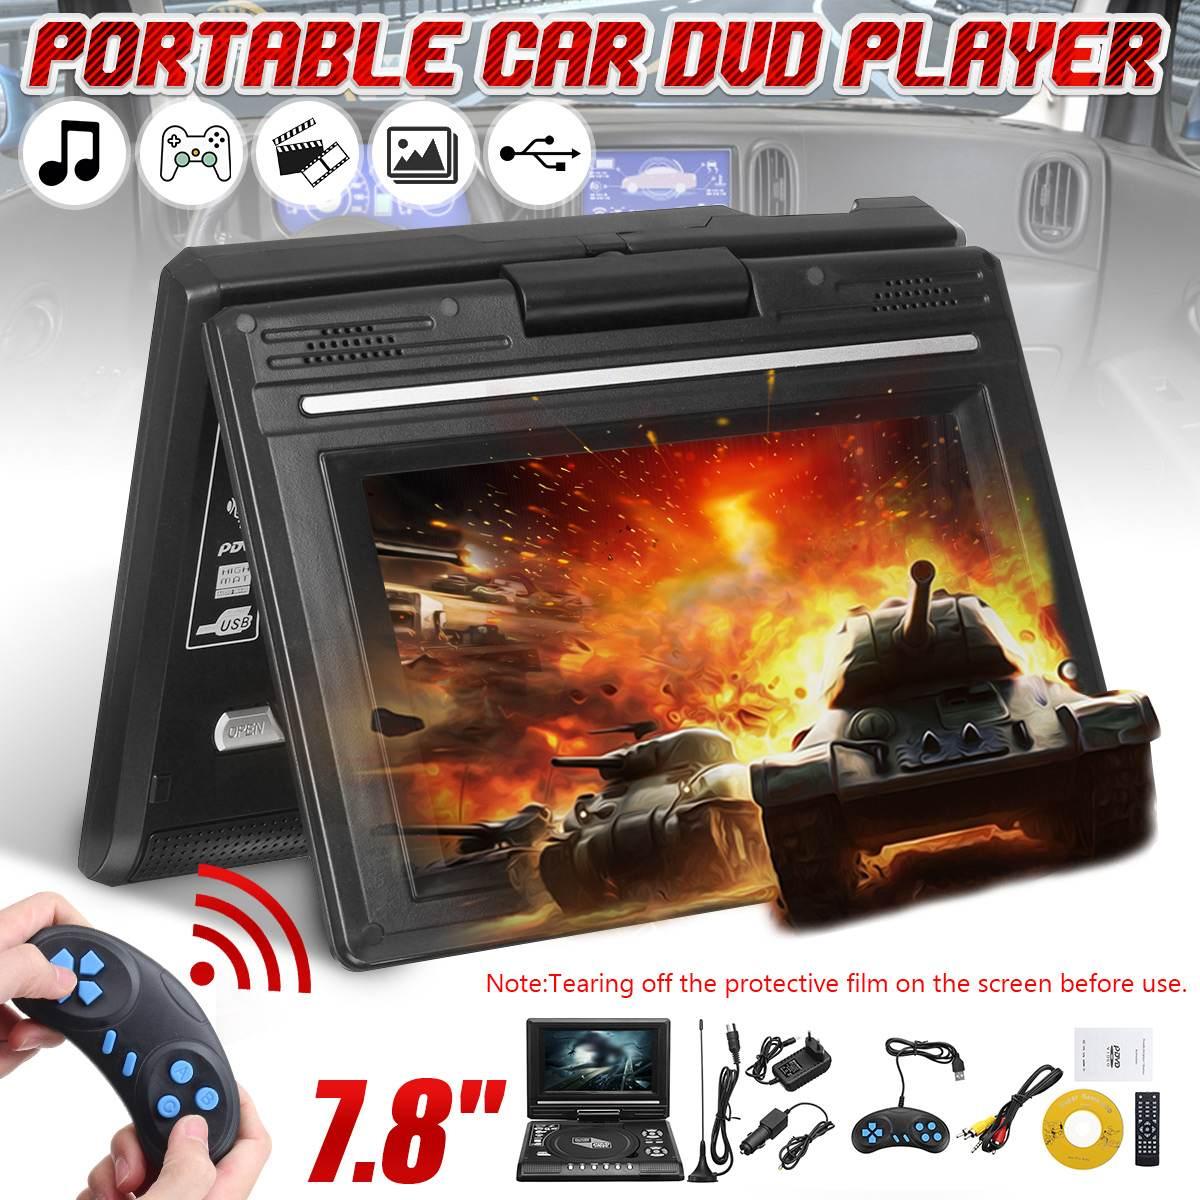 Portátil de 7,8 pulgadas HD TV casa coche reproductor de DVD VCD CD MP3 DVD USB SD reproductor de tarjetas RCA TV Portatil Cable juego 16:9 rotar pantalla LCD